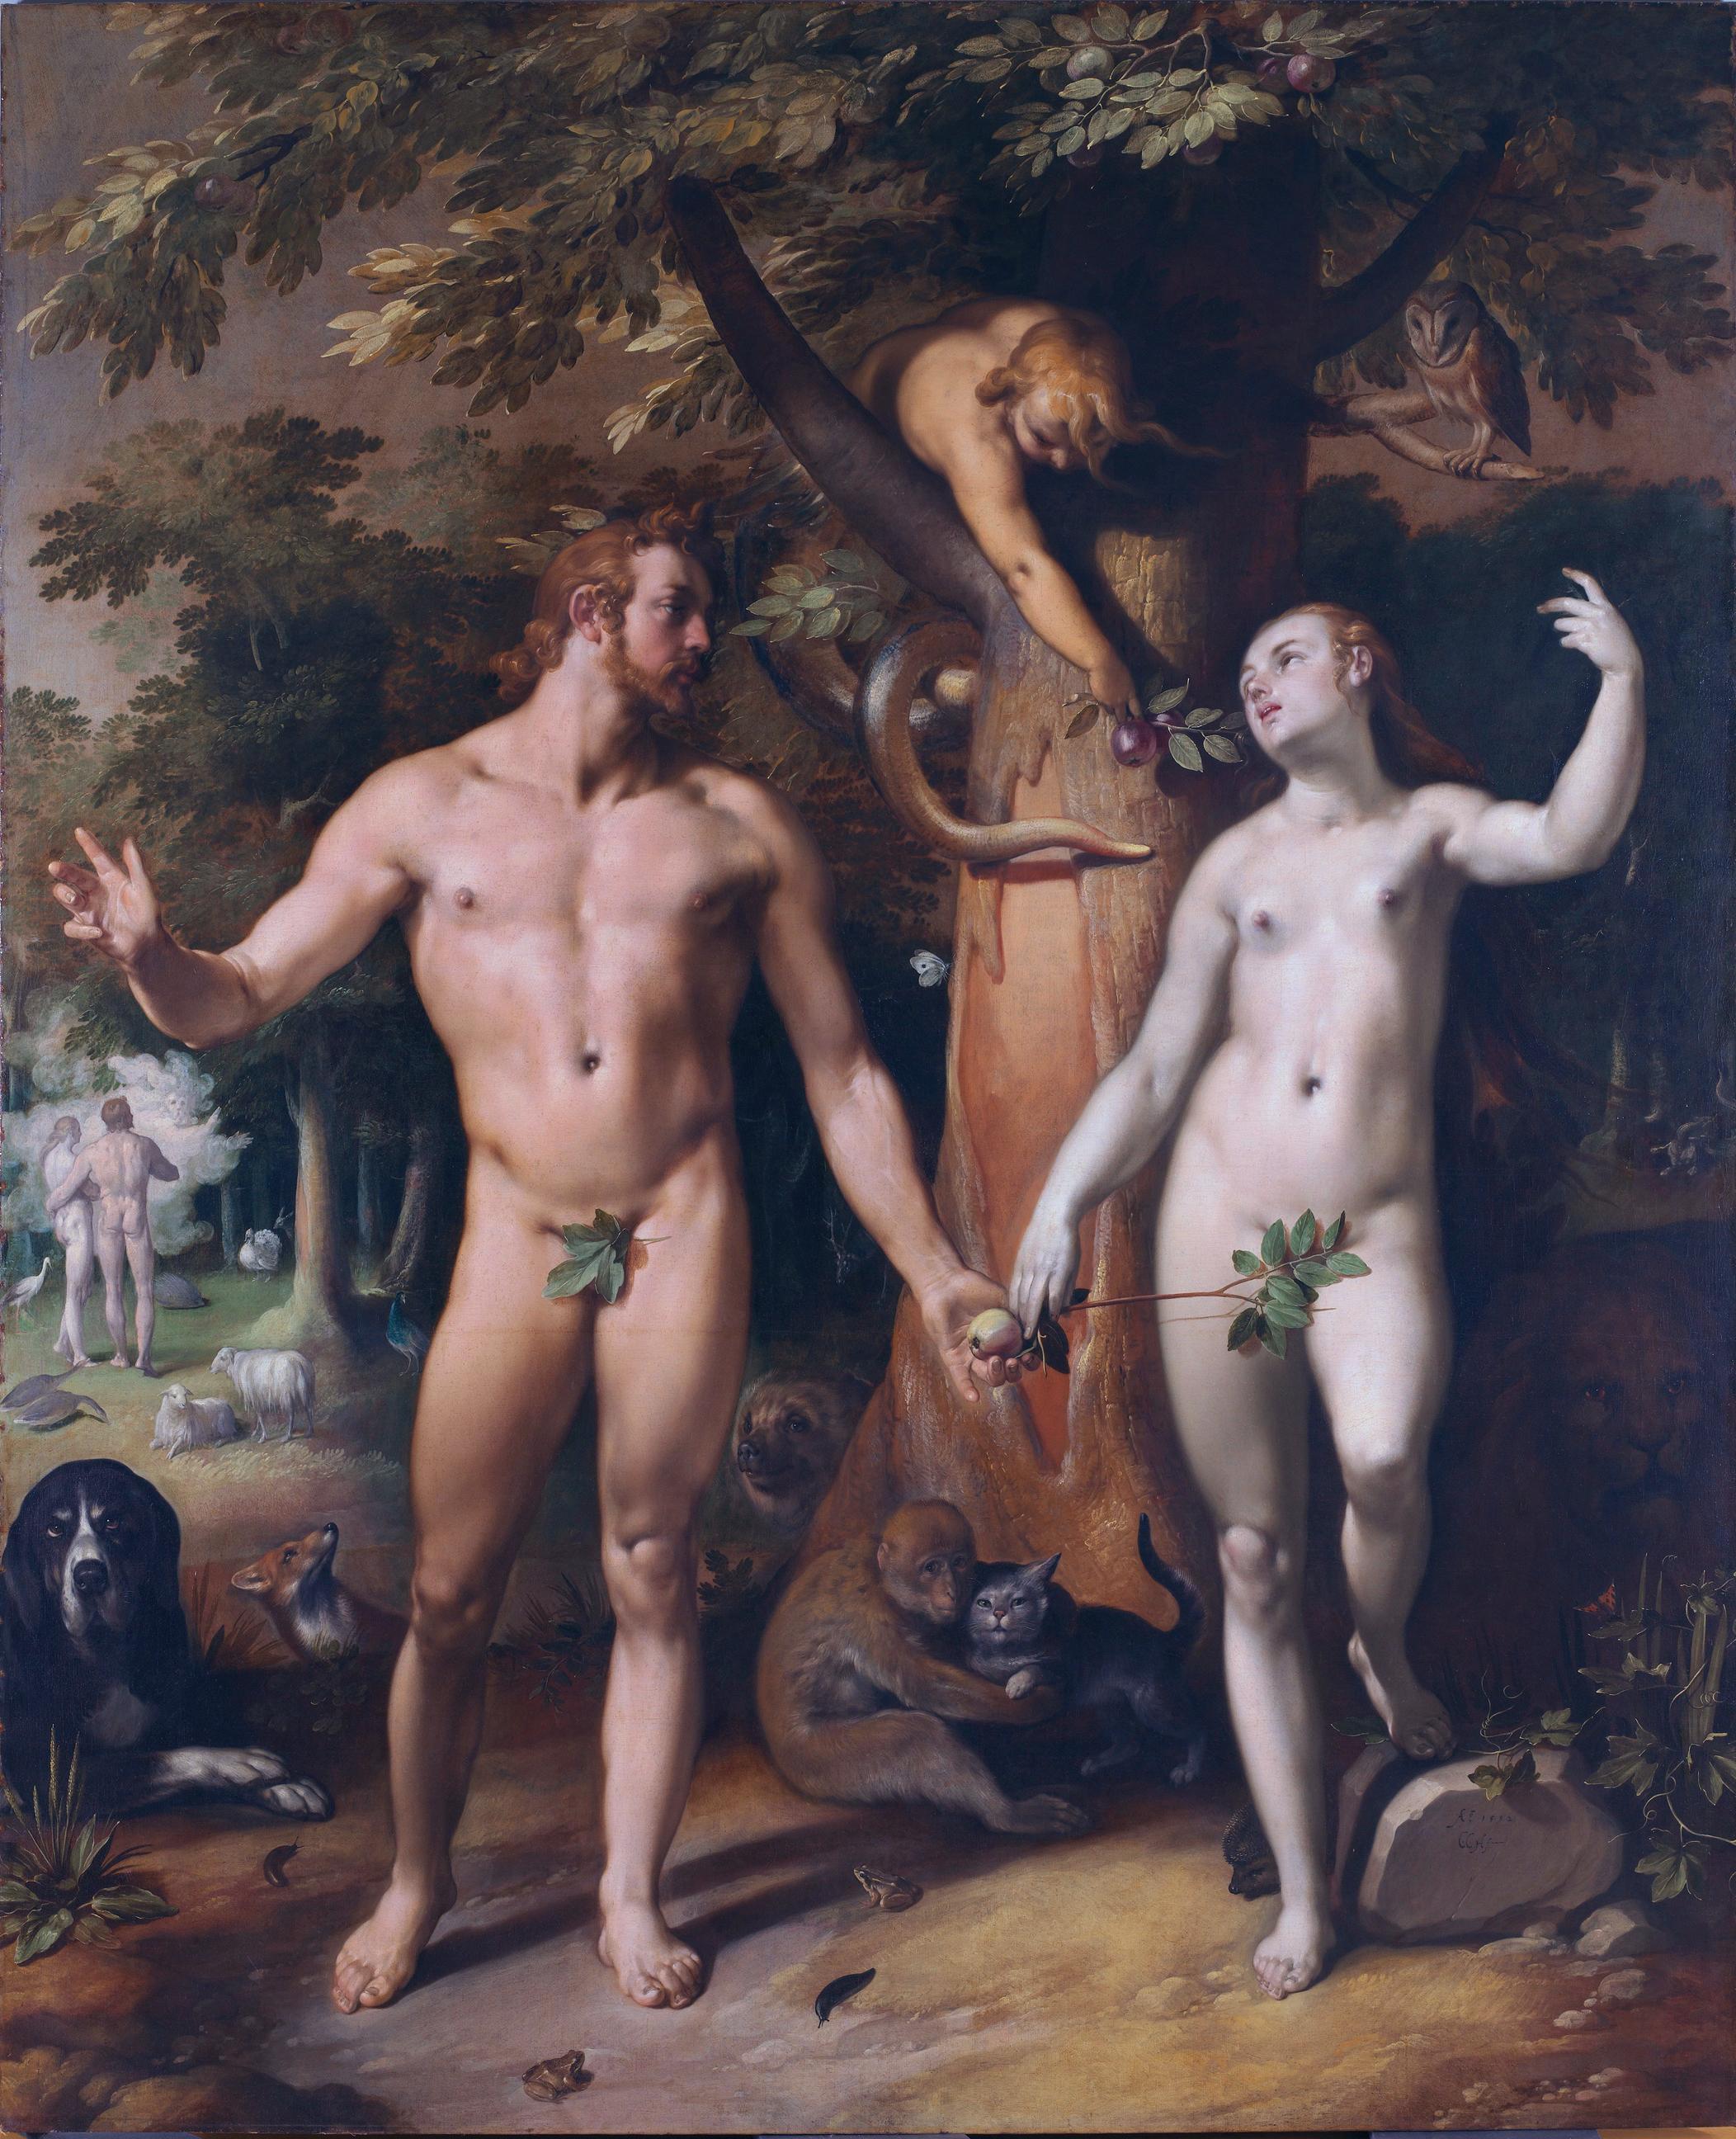 1592_Cornelis_van_Haarlem_-_La-Chute-de-lHomme.jpg